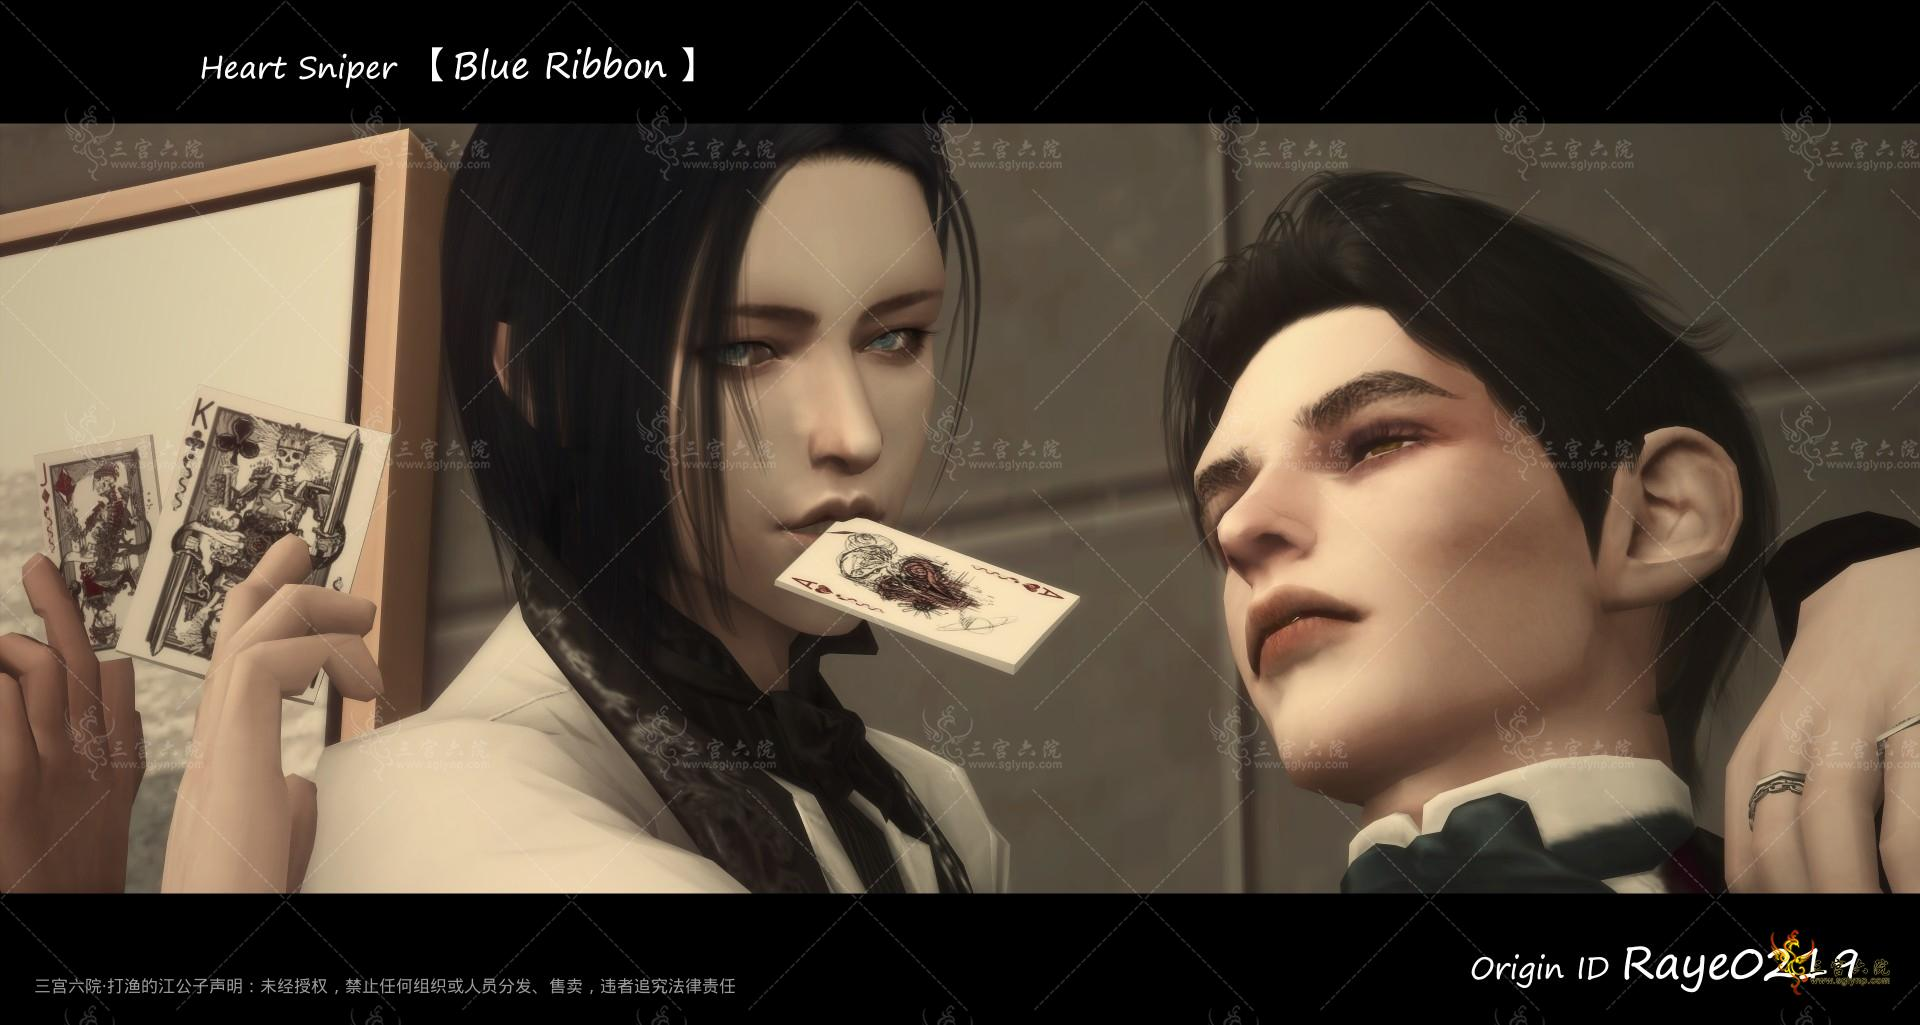 HS III [BLUE RIBBON] 03.png